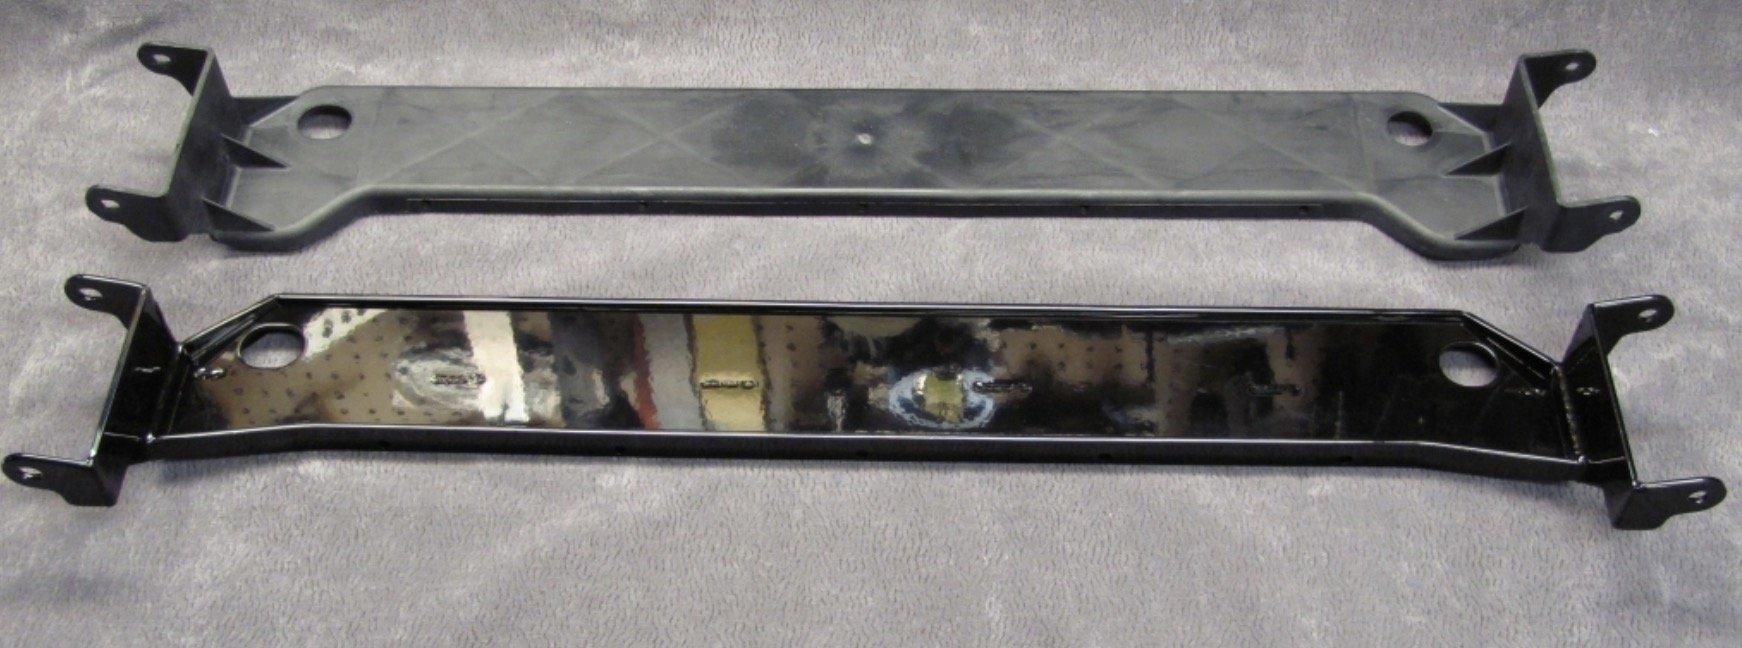 SSR Lower Radiator Support